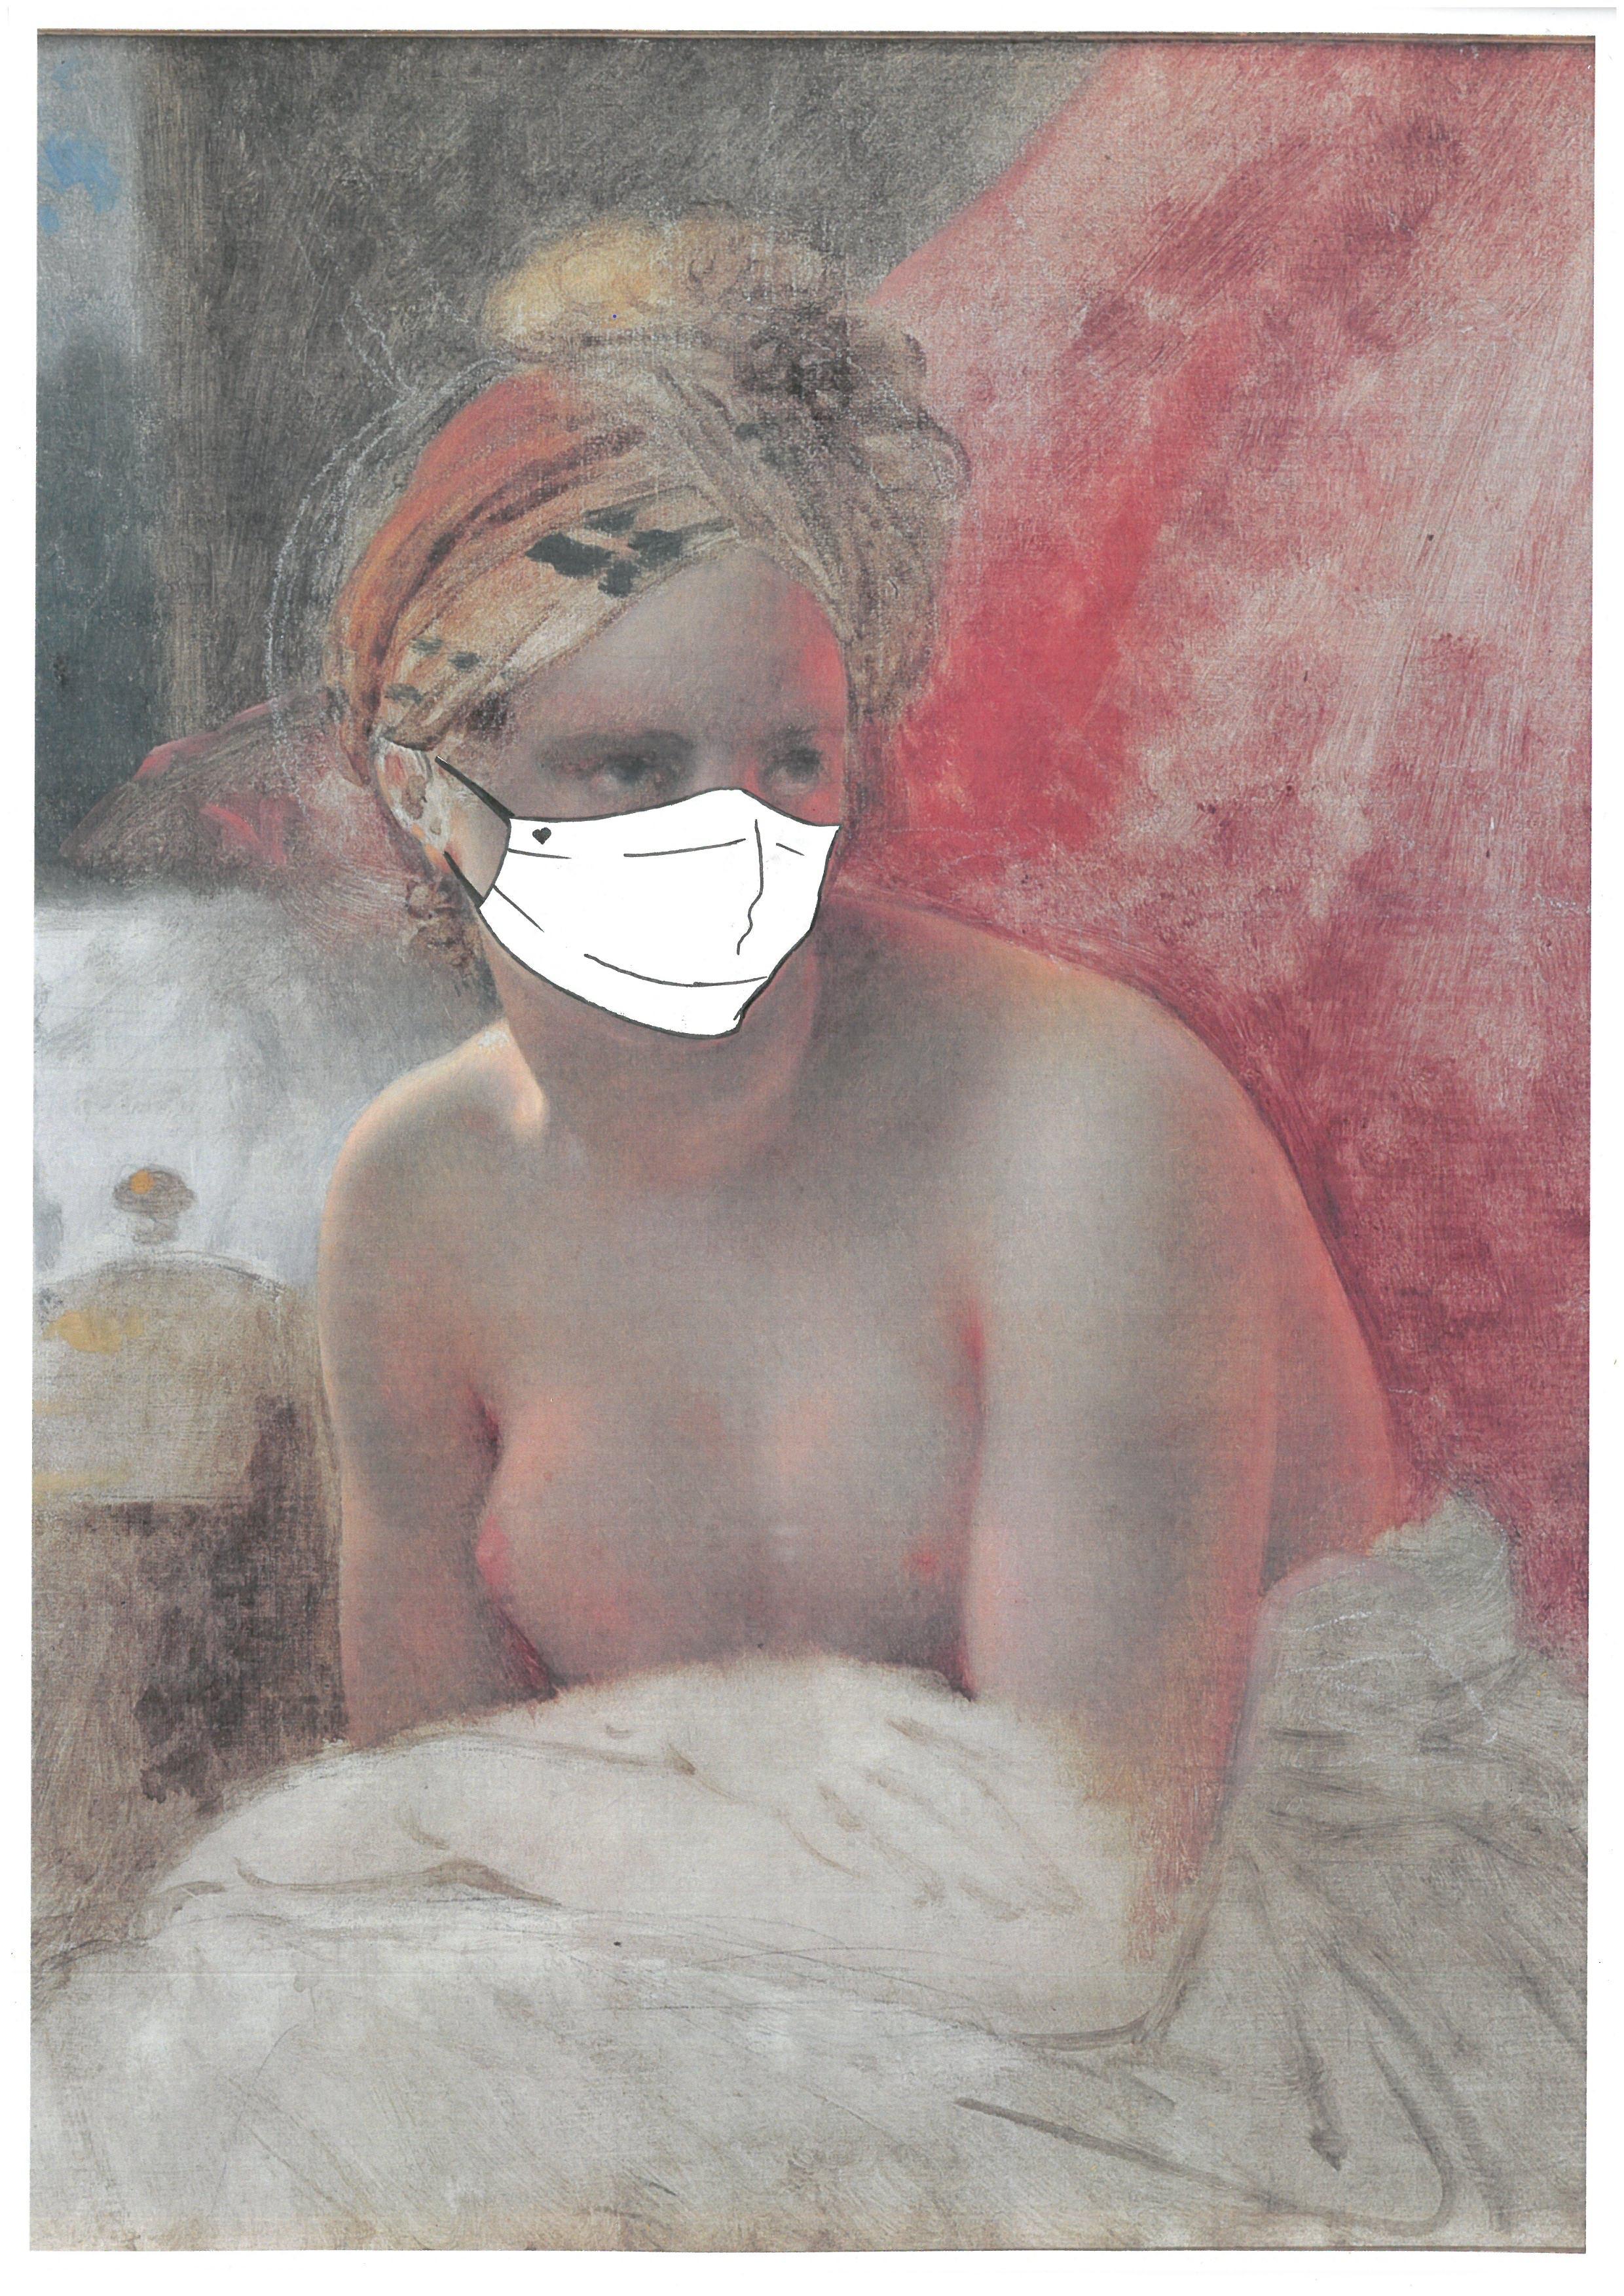 Girodet, L'Odalisque (masquée), du compte Facebook du musée Girodet, Montargis @musee.girodet